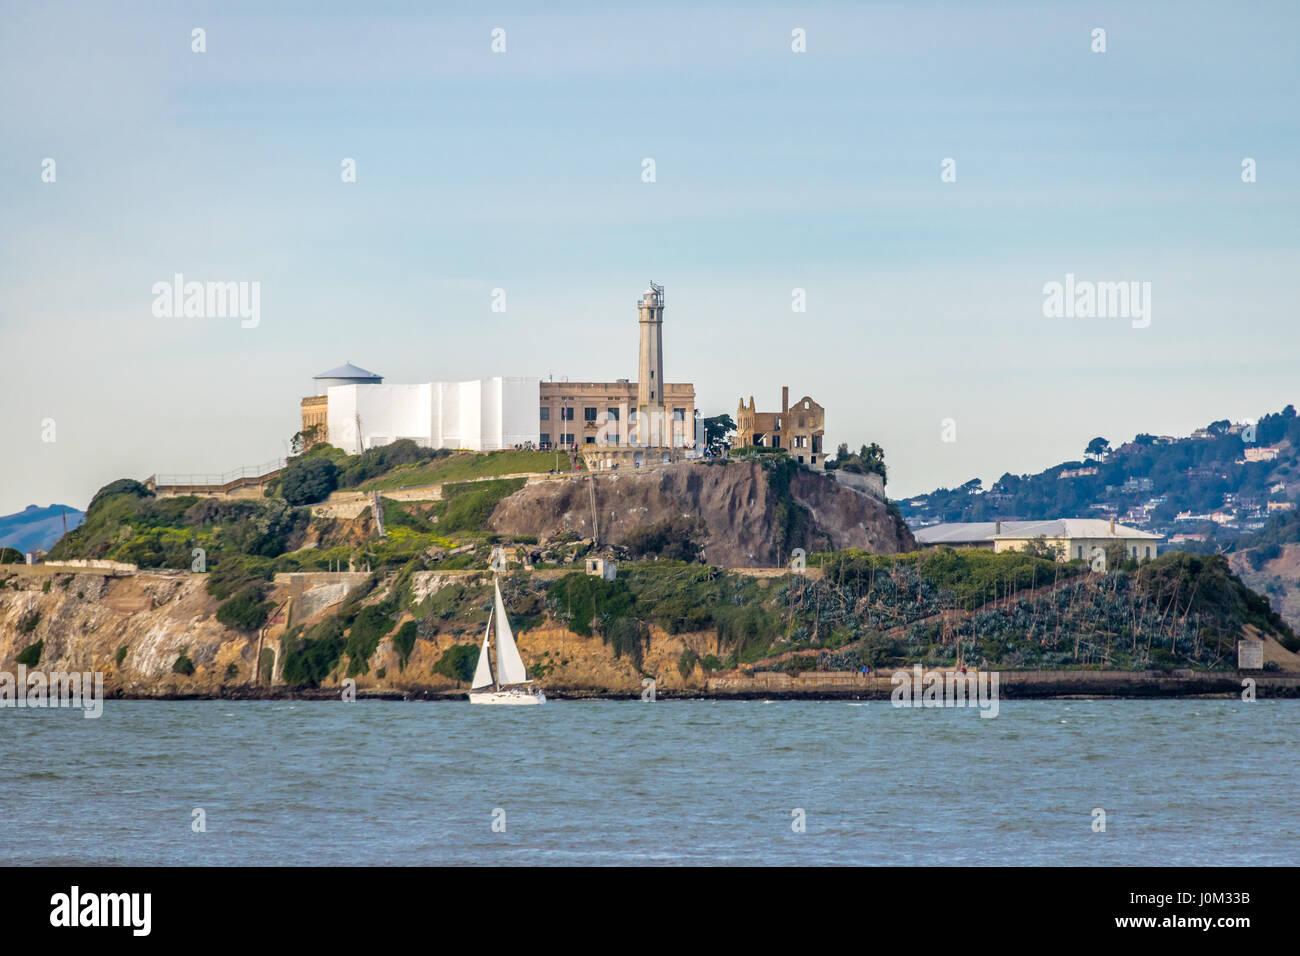 Alcatraz Island - San Francisco, California, USA - Stock Image